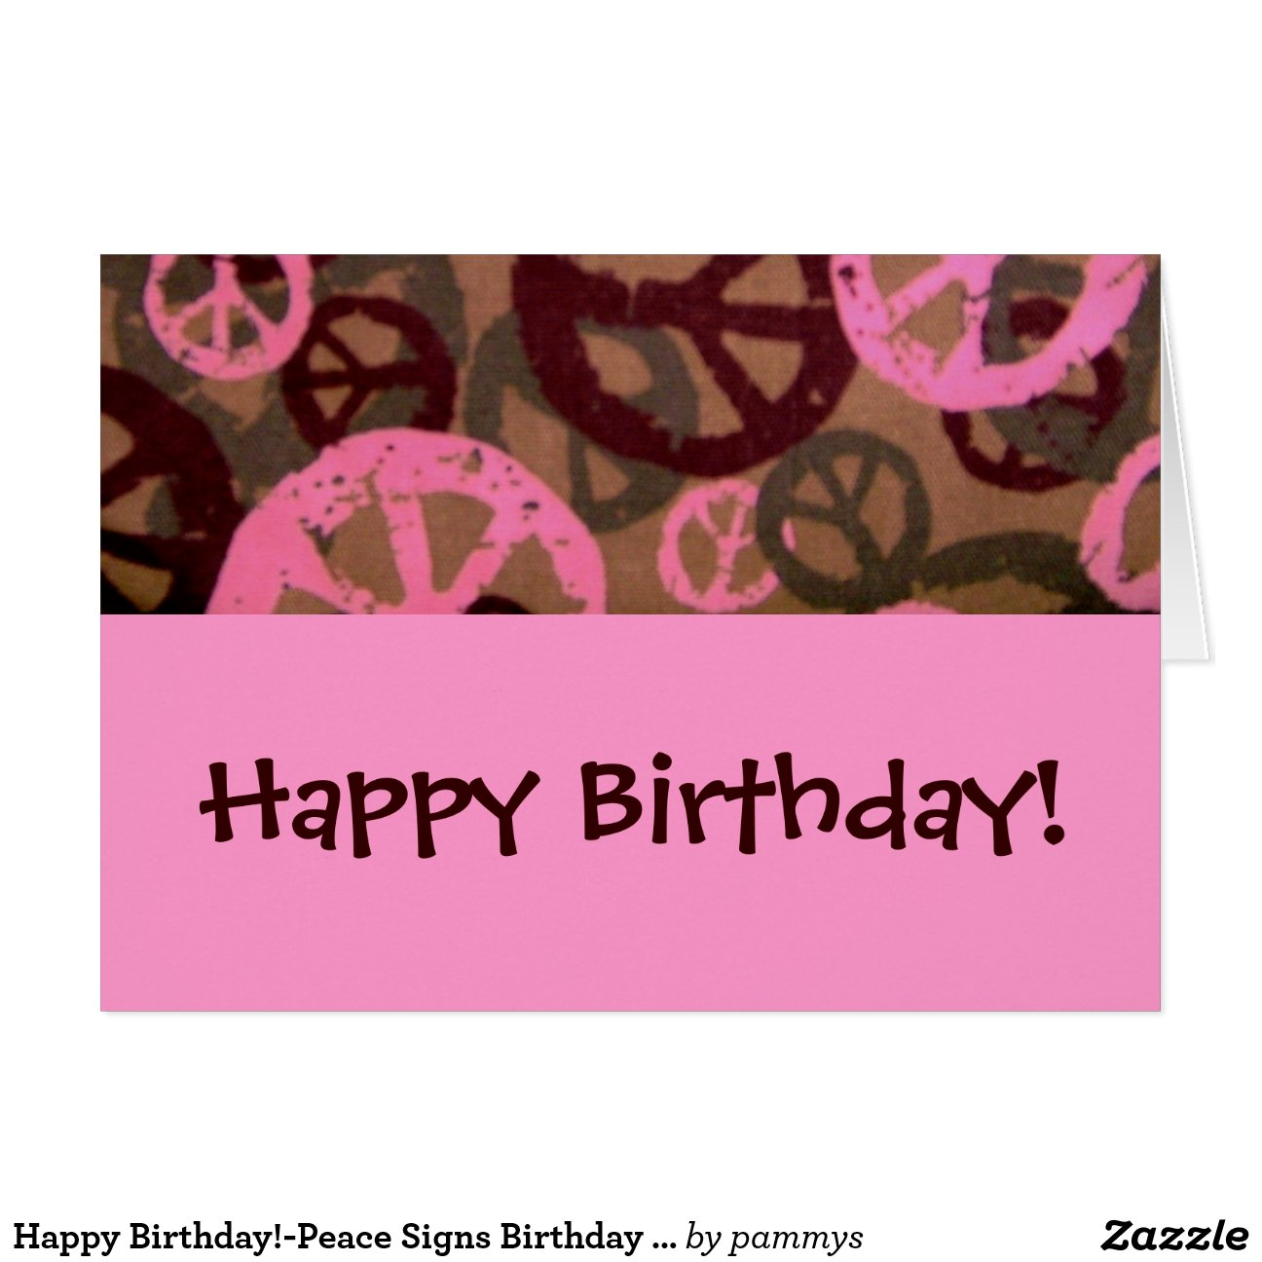 Happybirthdaypeacesignsbirthdaycard